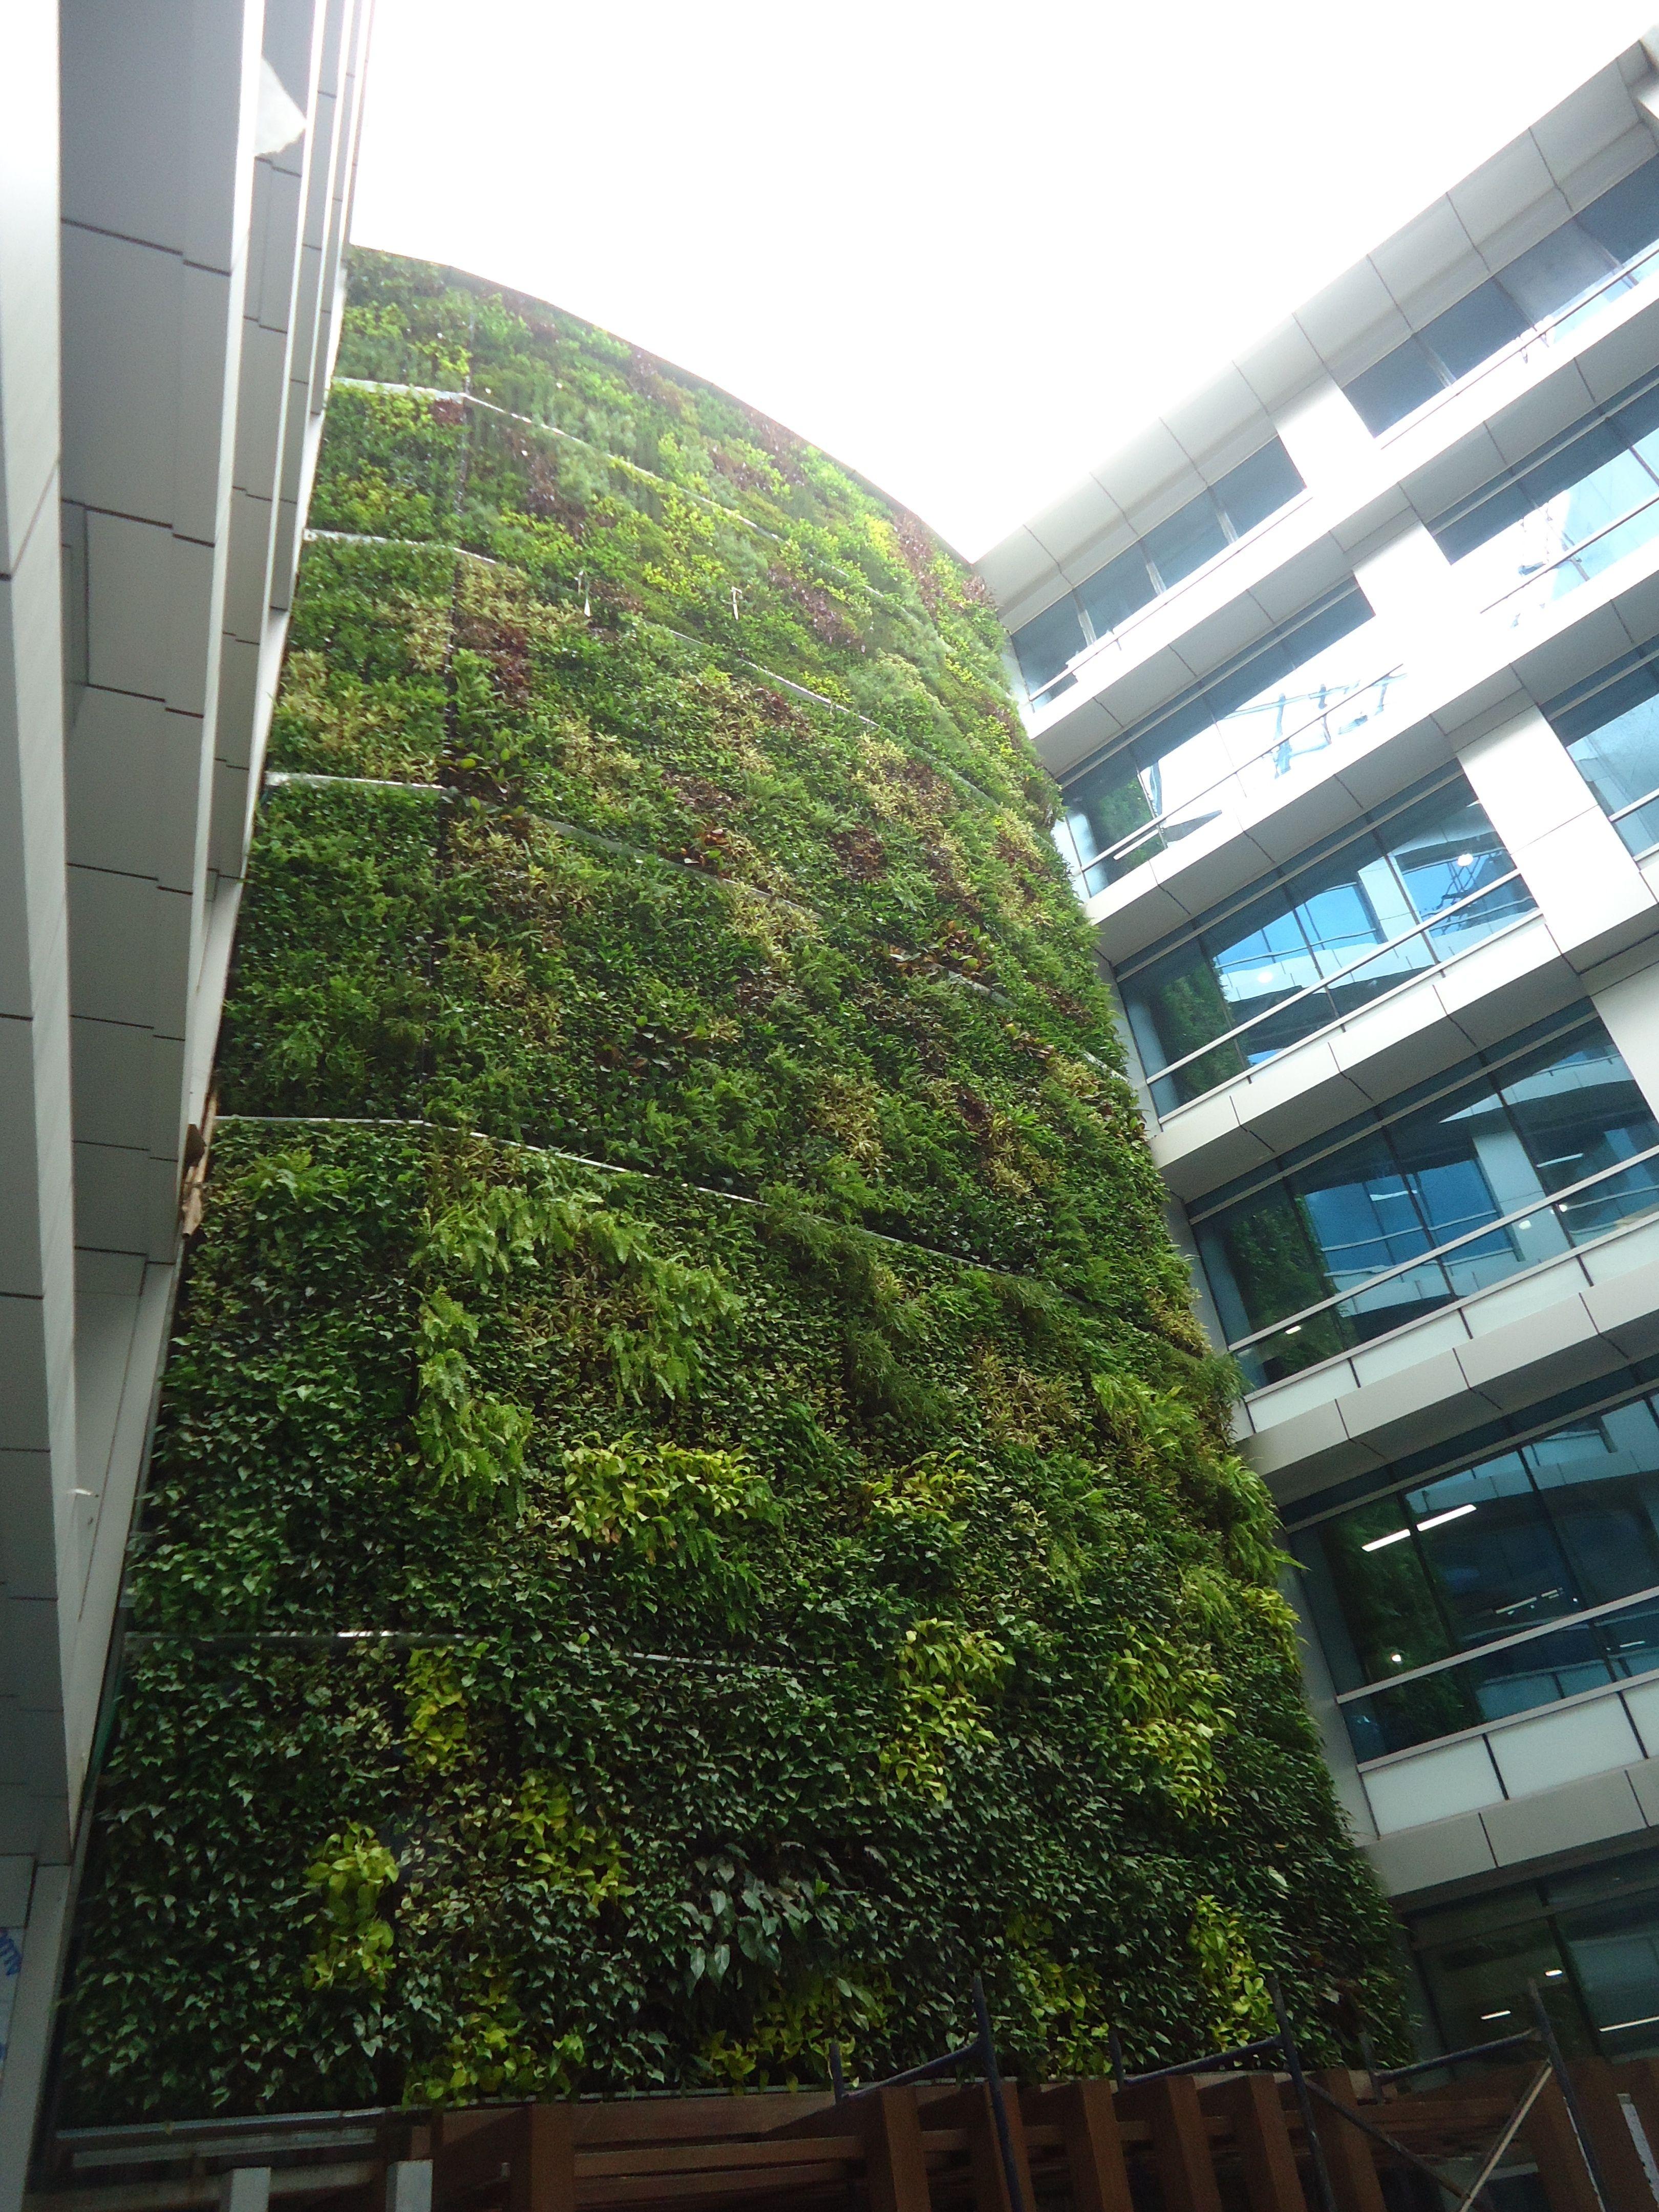 ELT Green Wall at HDFC Mumbai, India. | Vertical Gardens ...